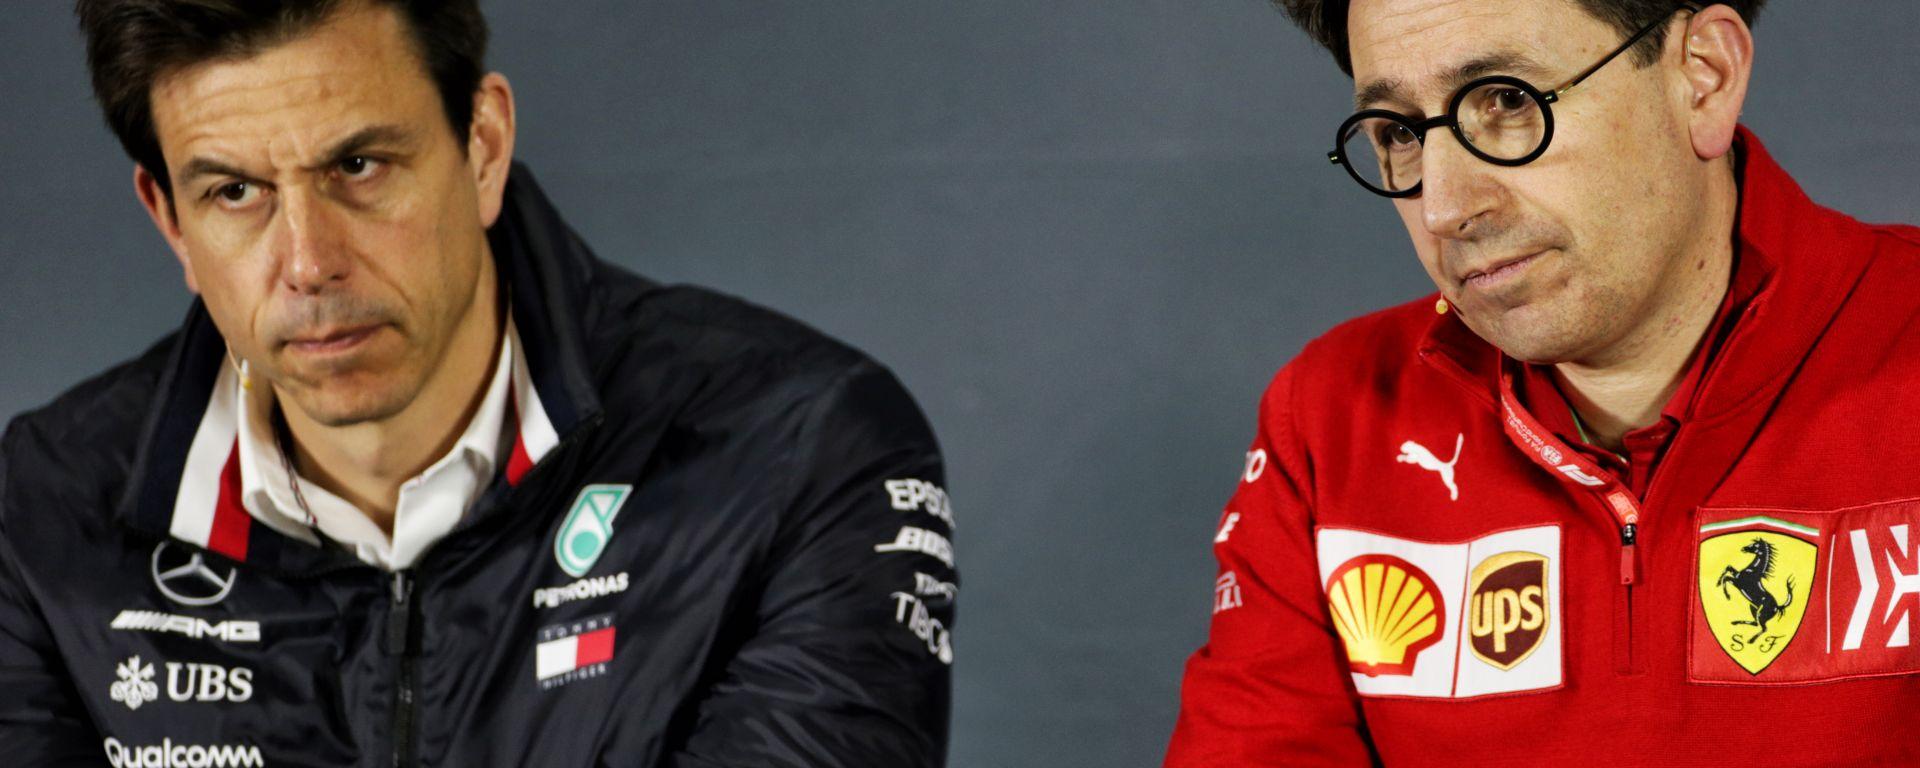 F1 GP Cina 2019, Shanghai: Toto Wolff (Mercedes) e Mattia Binotto (Ferrari)